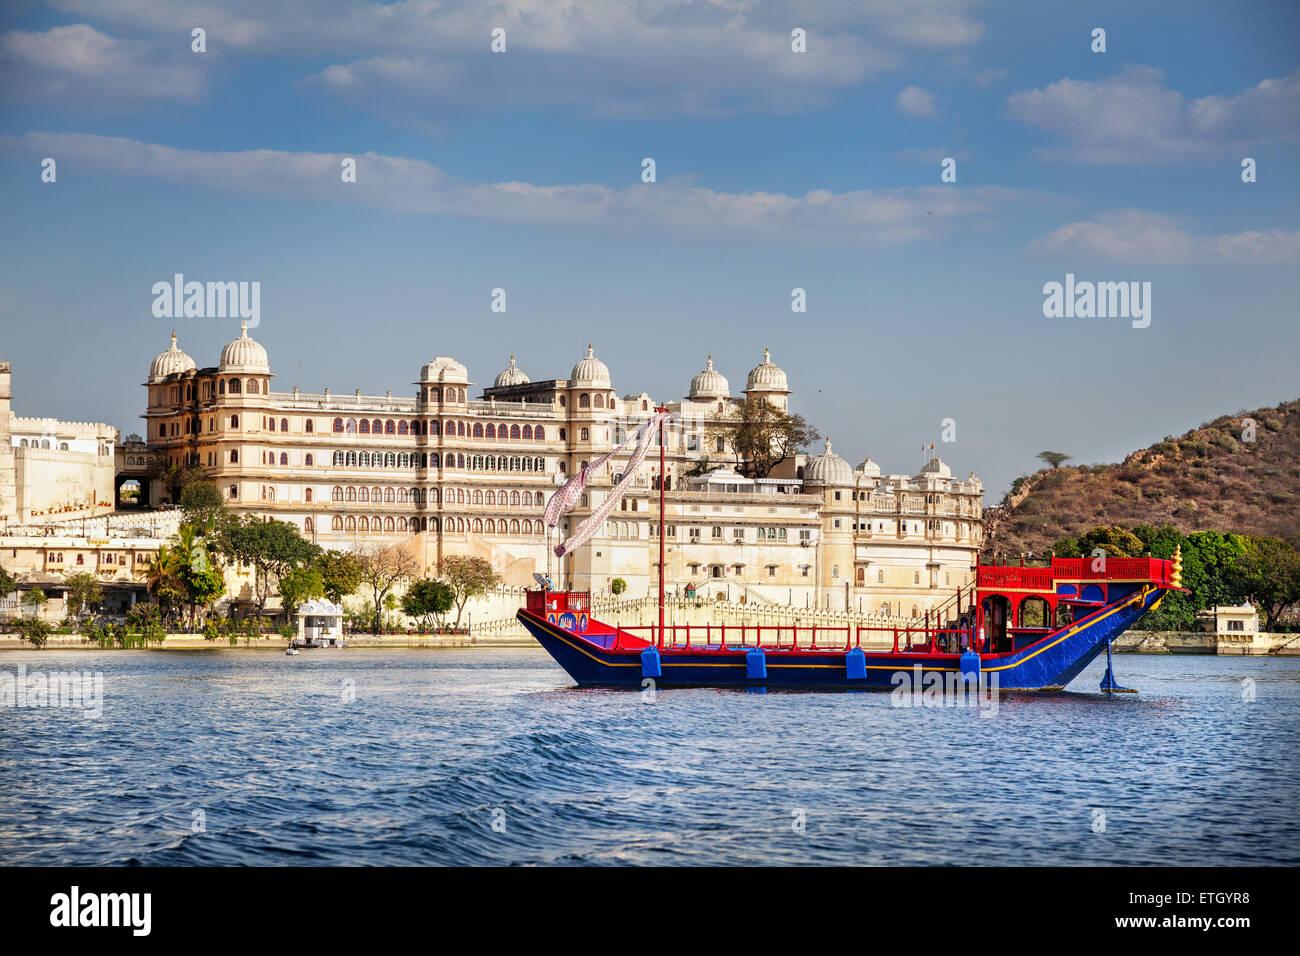 Barca sul Lago Pichola con City Palace vista sul cielo blu in Udaipur, Rajasthan, India Foto Stock